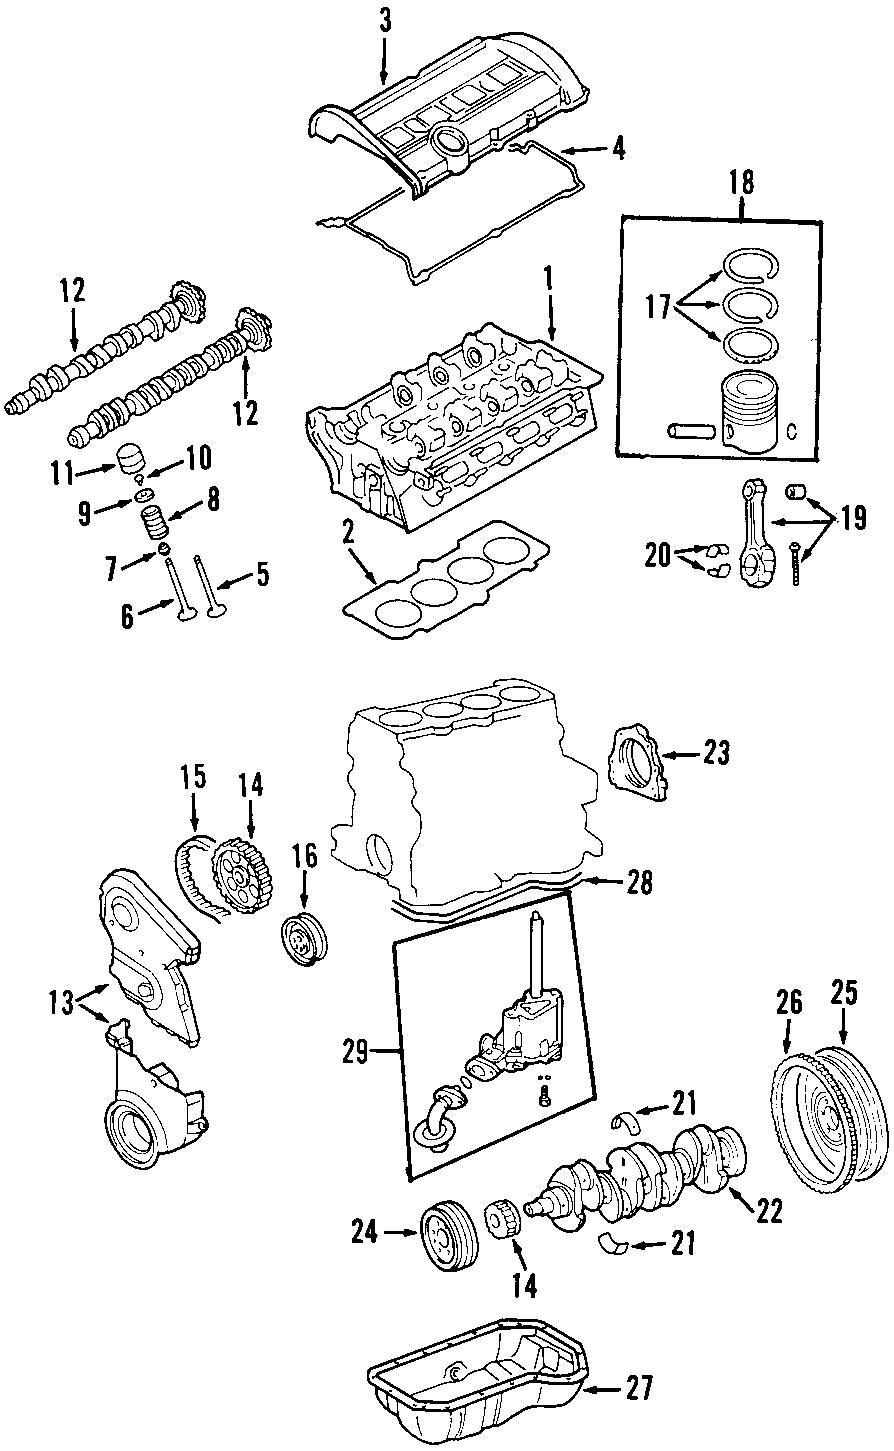 2001 Volkswagen Golf Engine Oil Pump. A4. Beetle